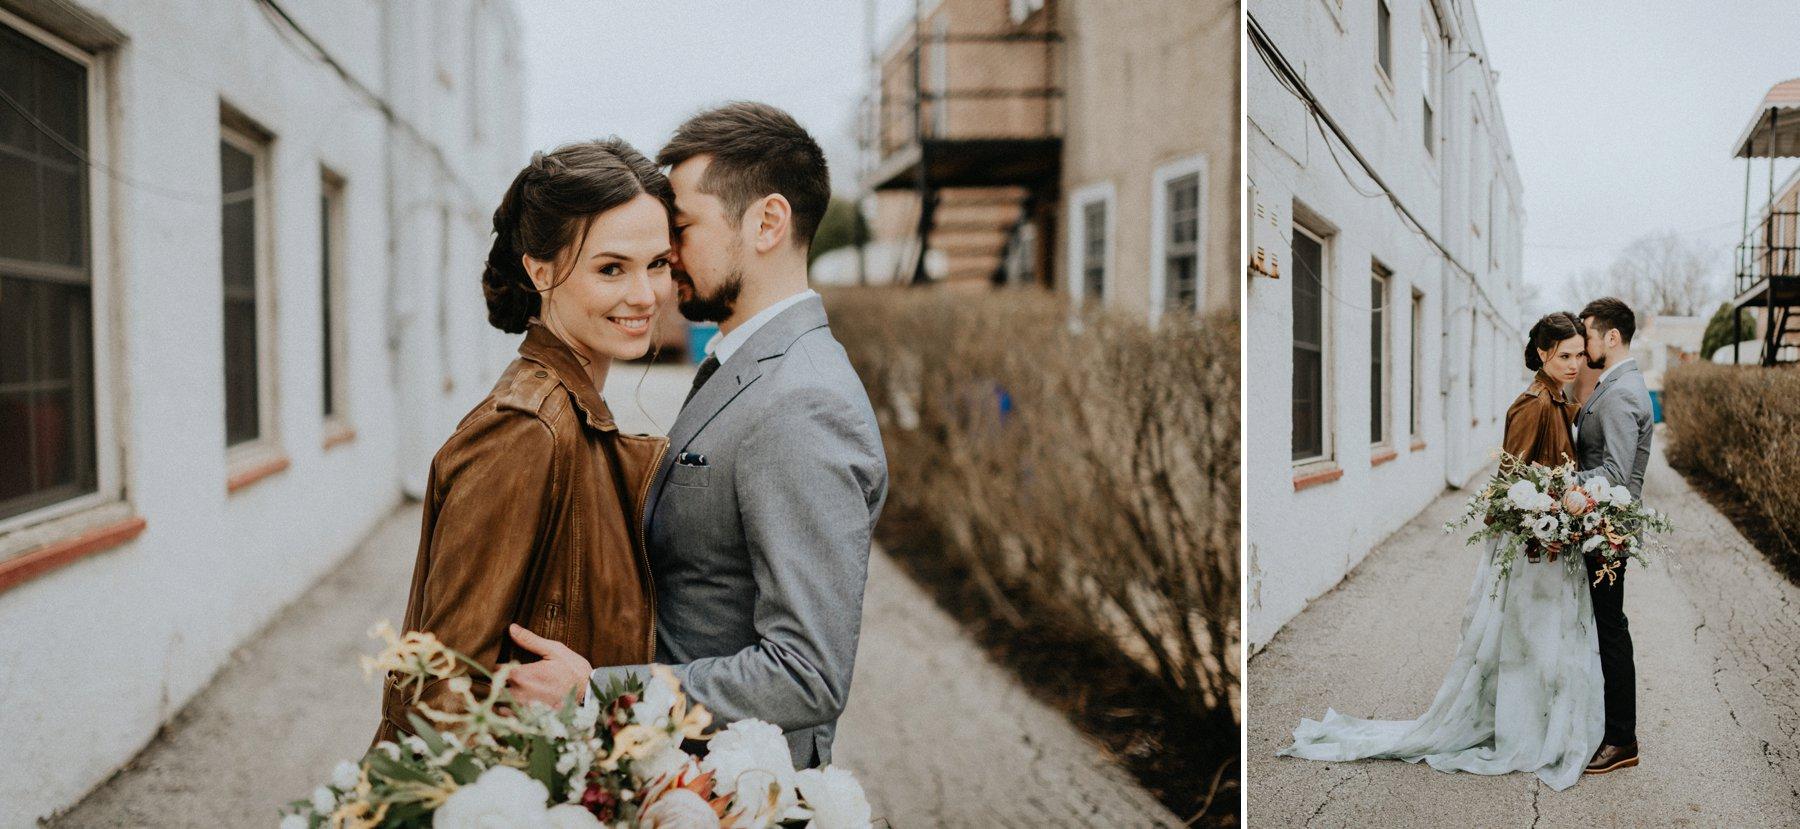 greenhouse-botanical-wedding-21.jpg